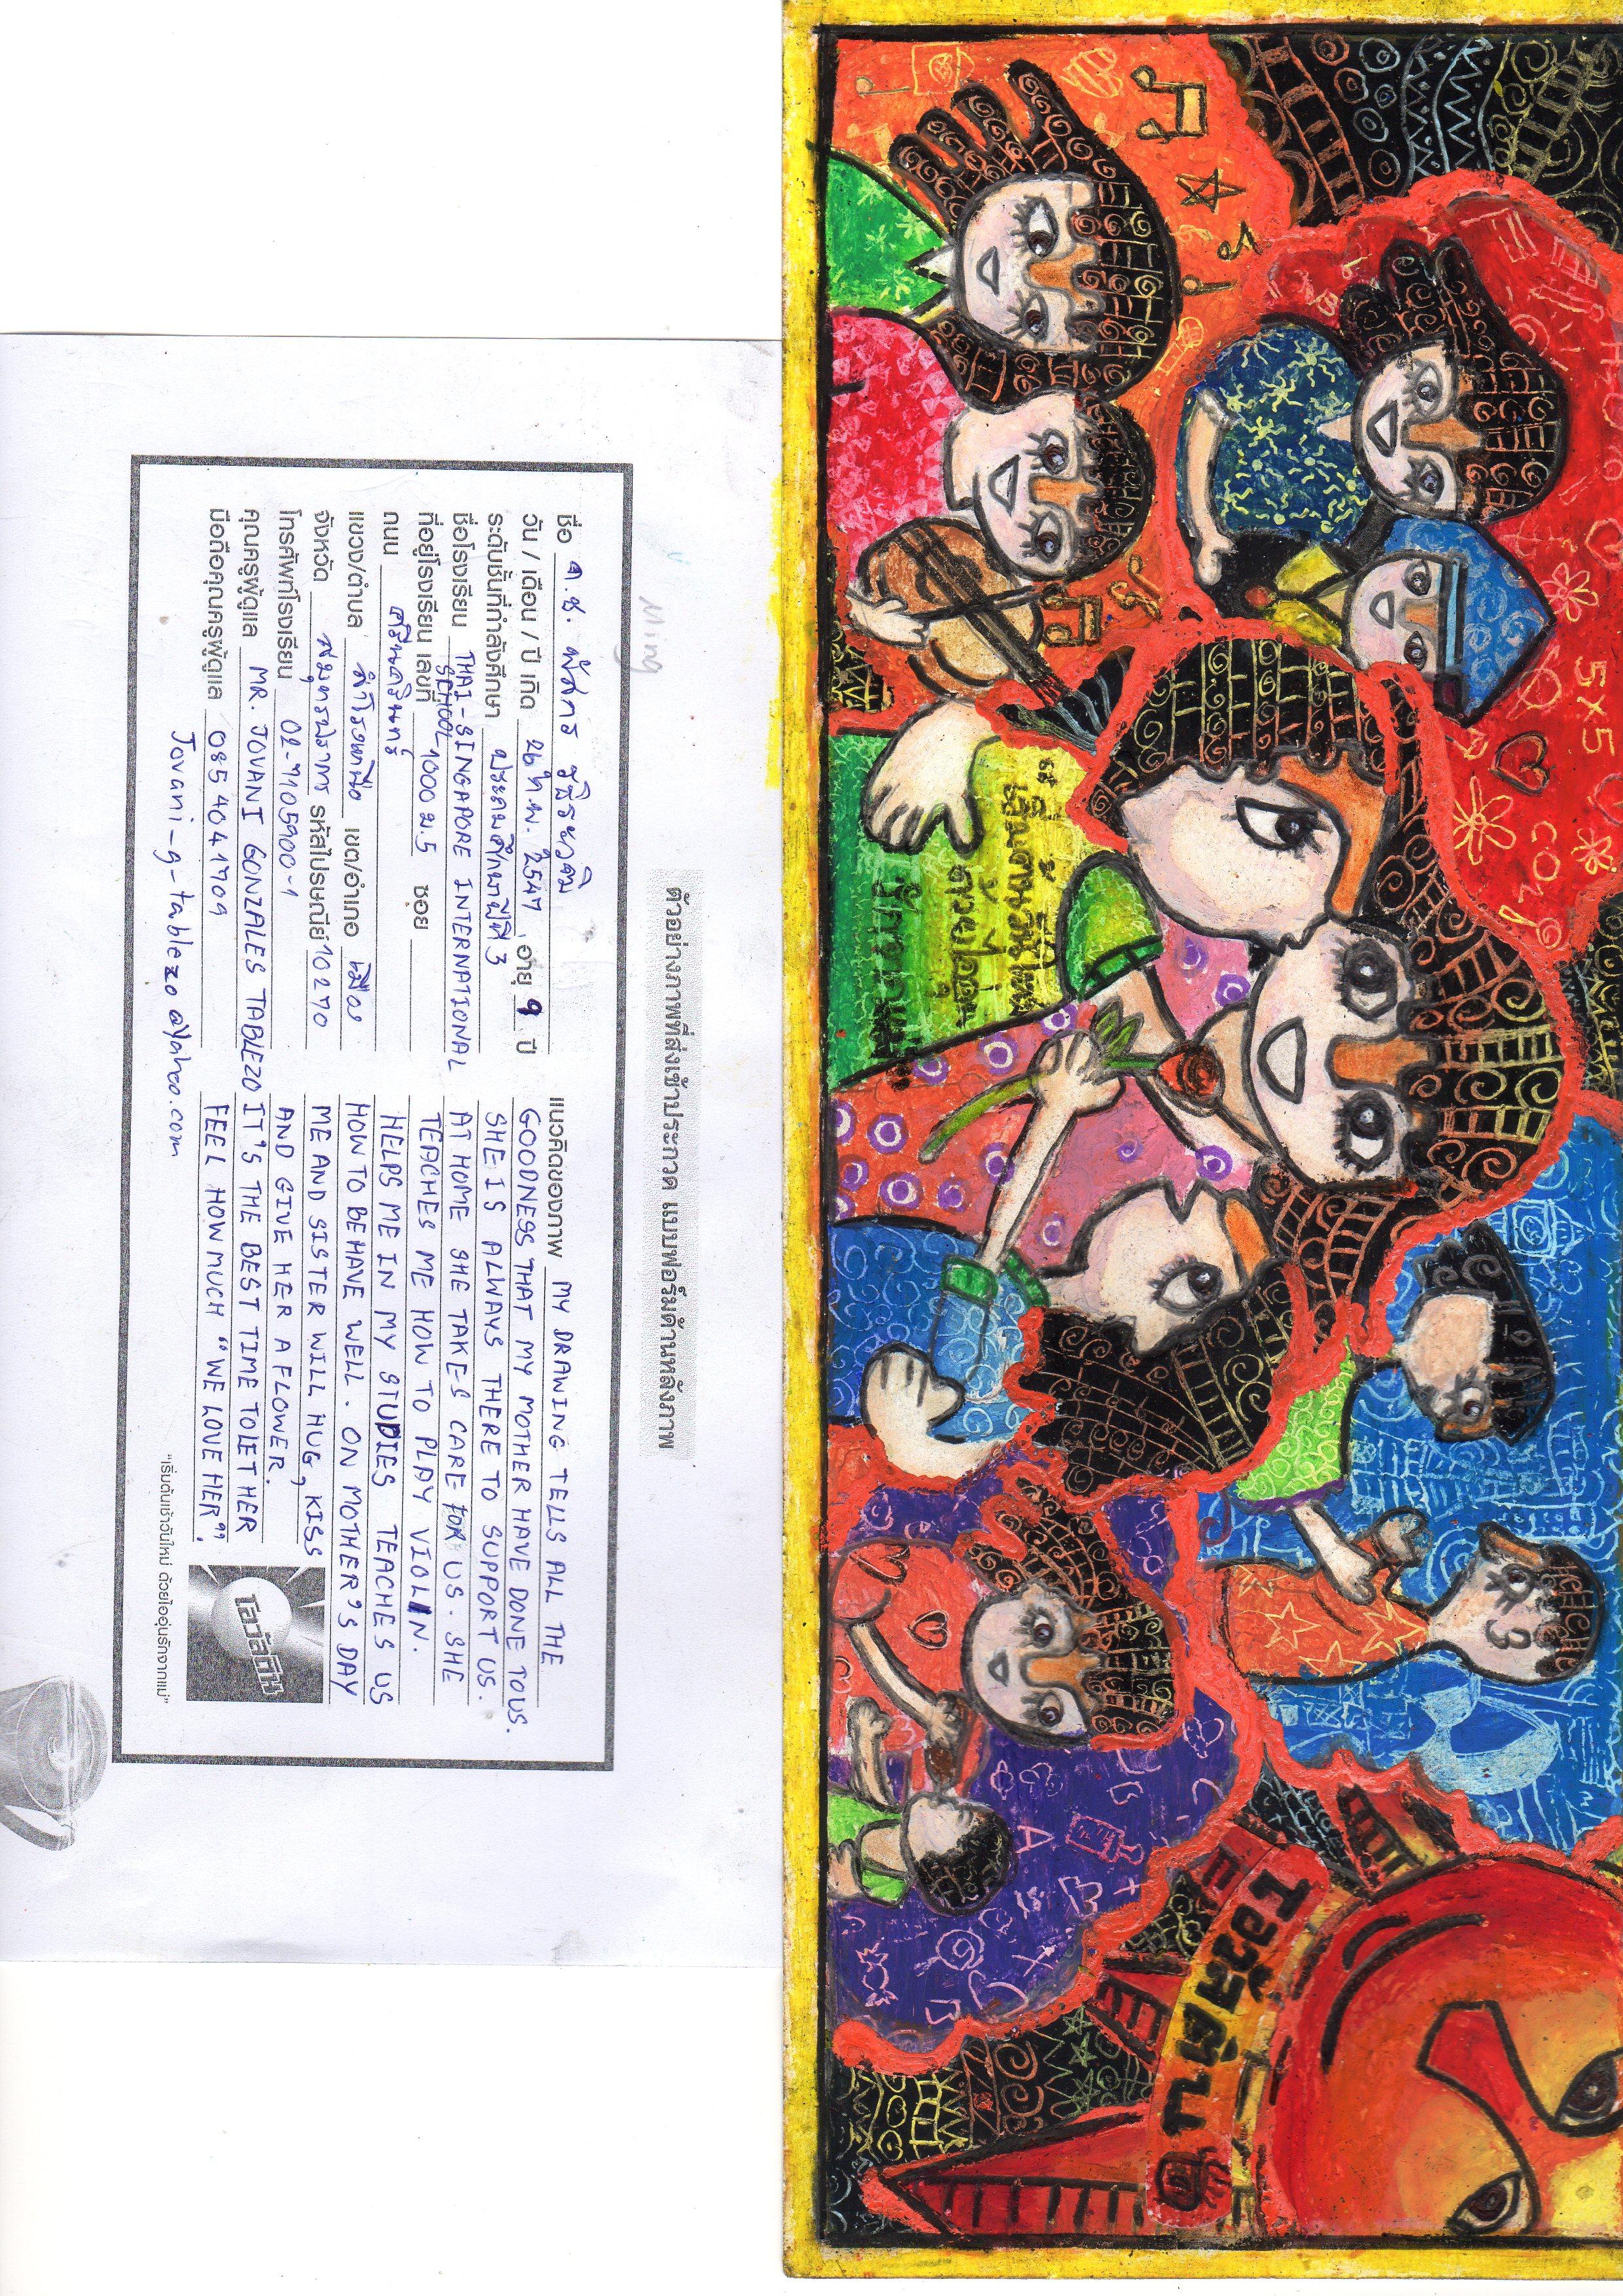 P4 Student Receives Art Certificate Thai Singapore International